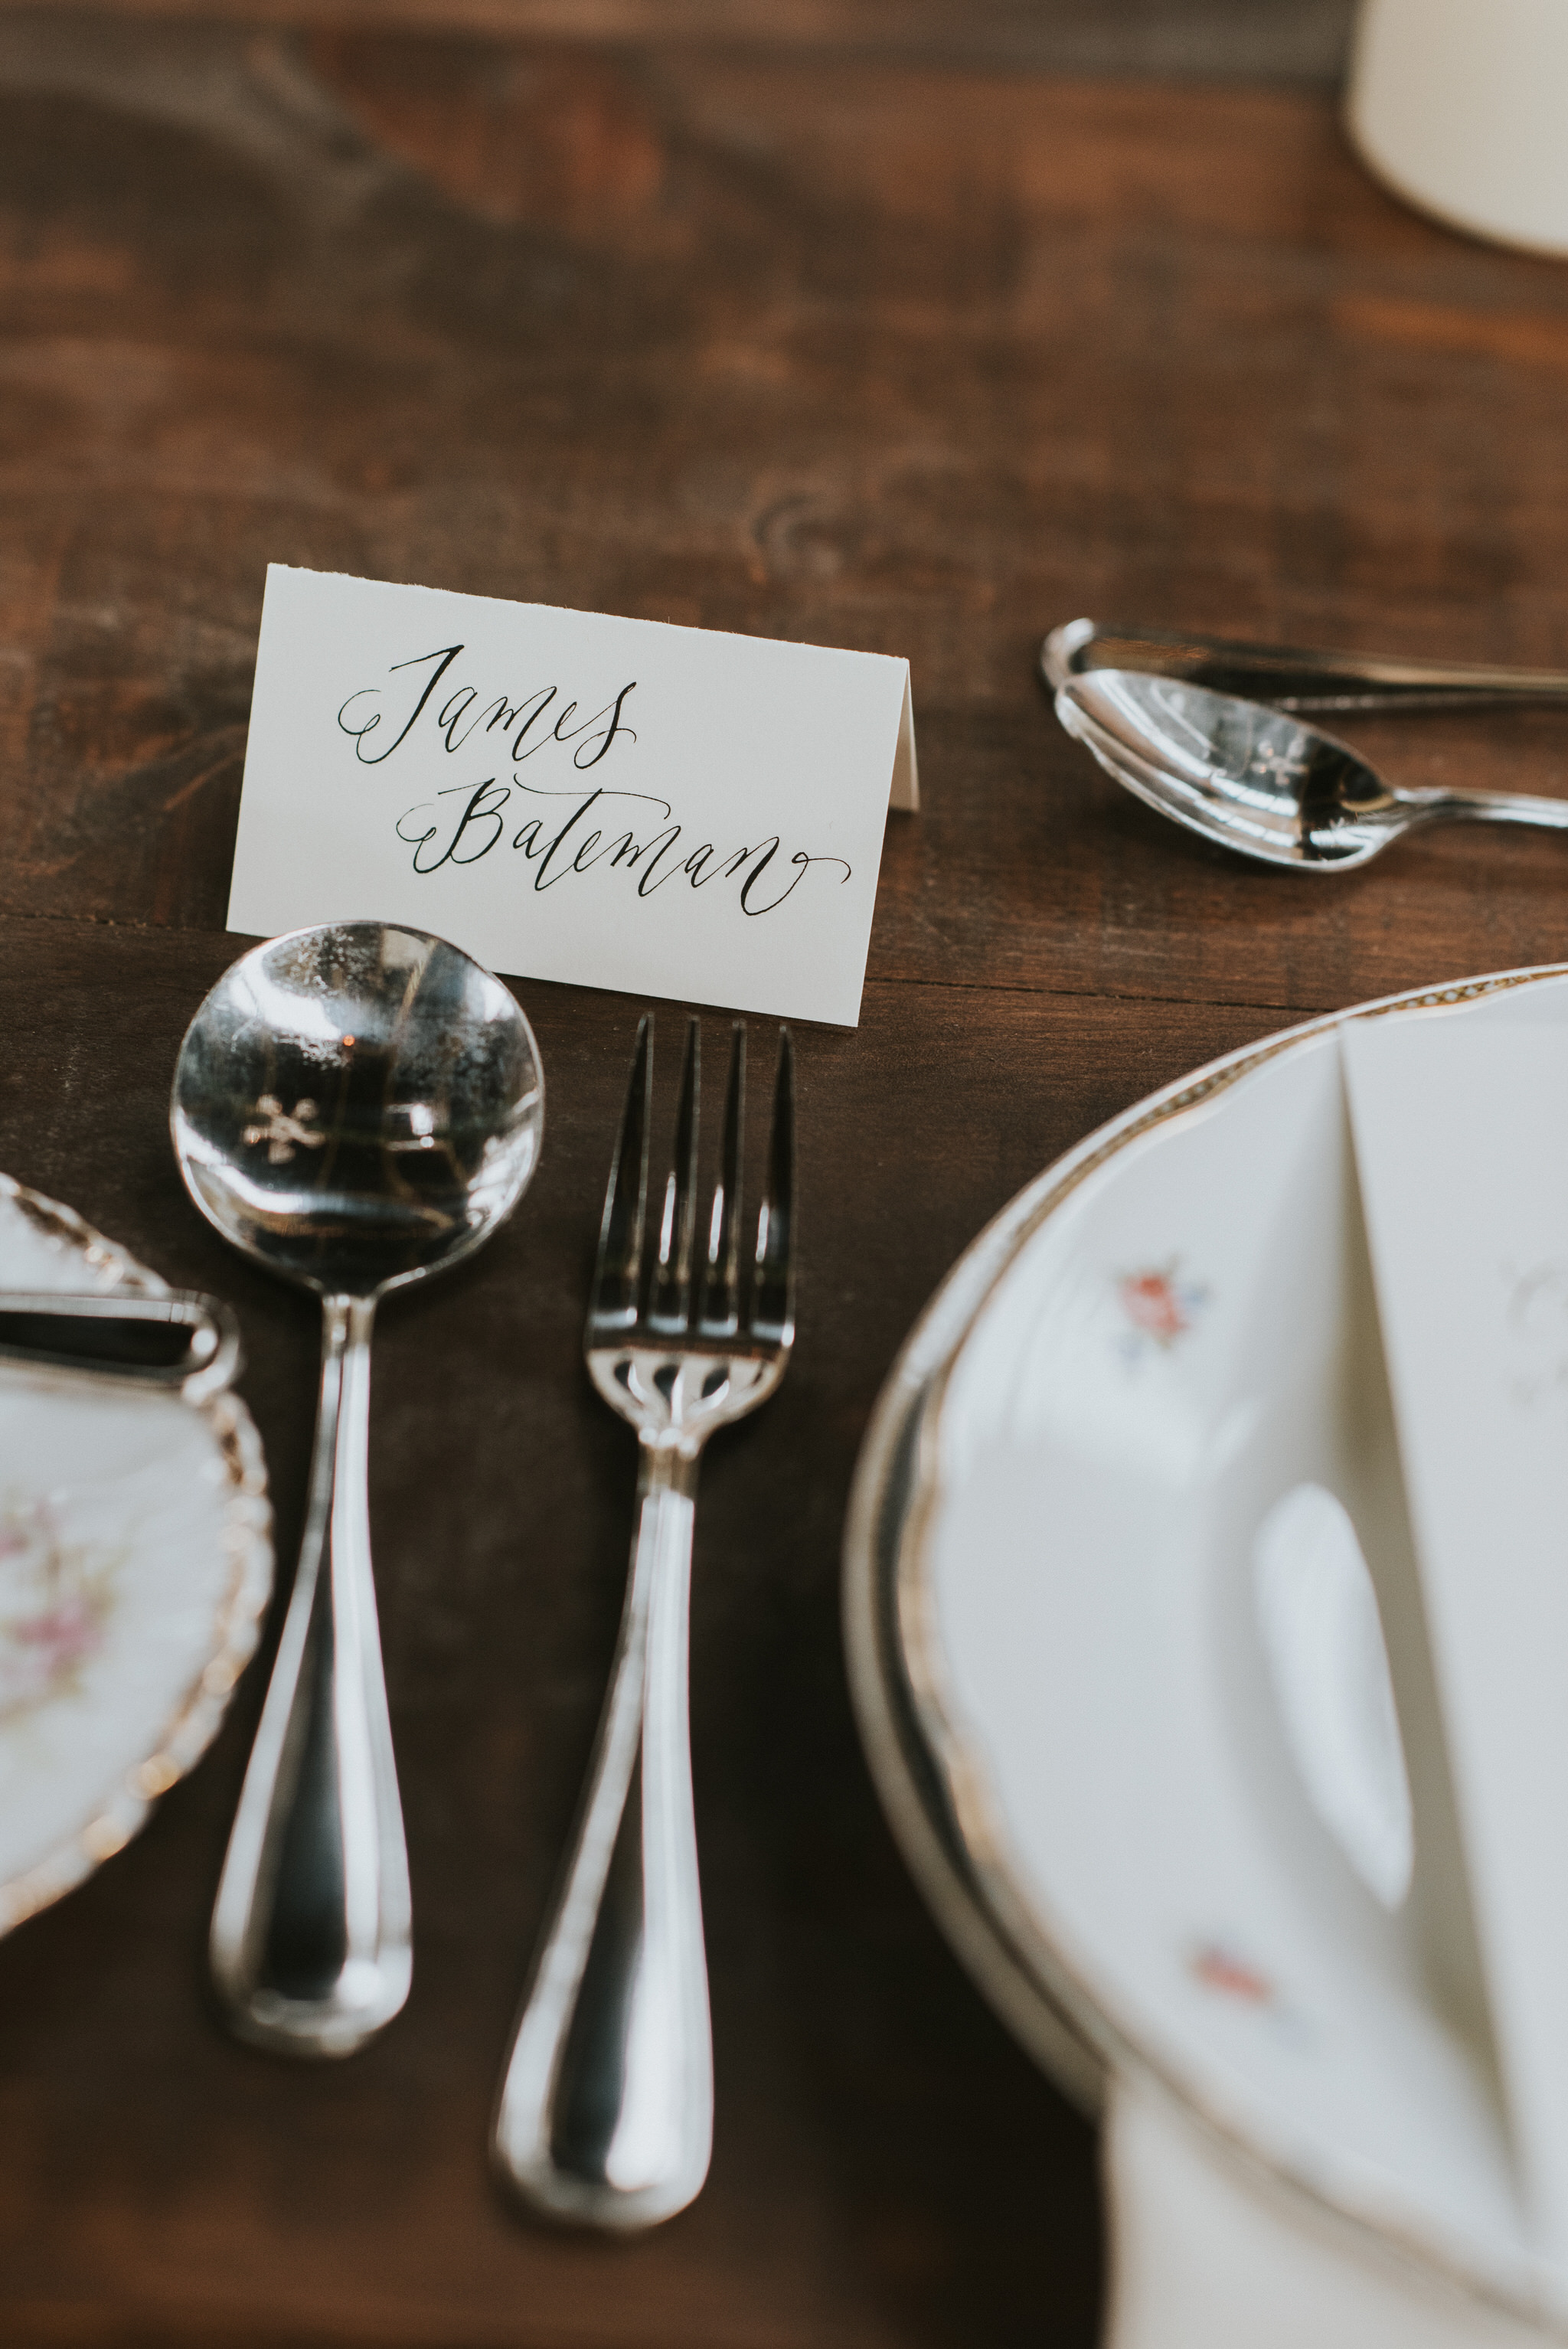 scarletoneillphotography_weddingphotography_prince edward county weddings090.JPG